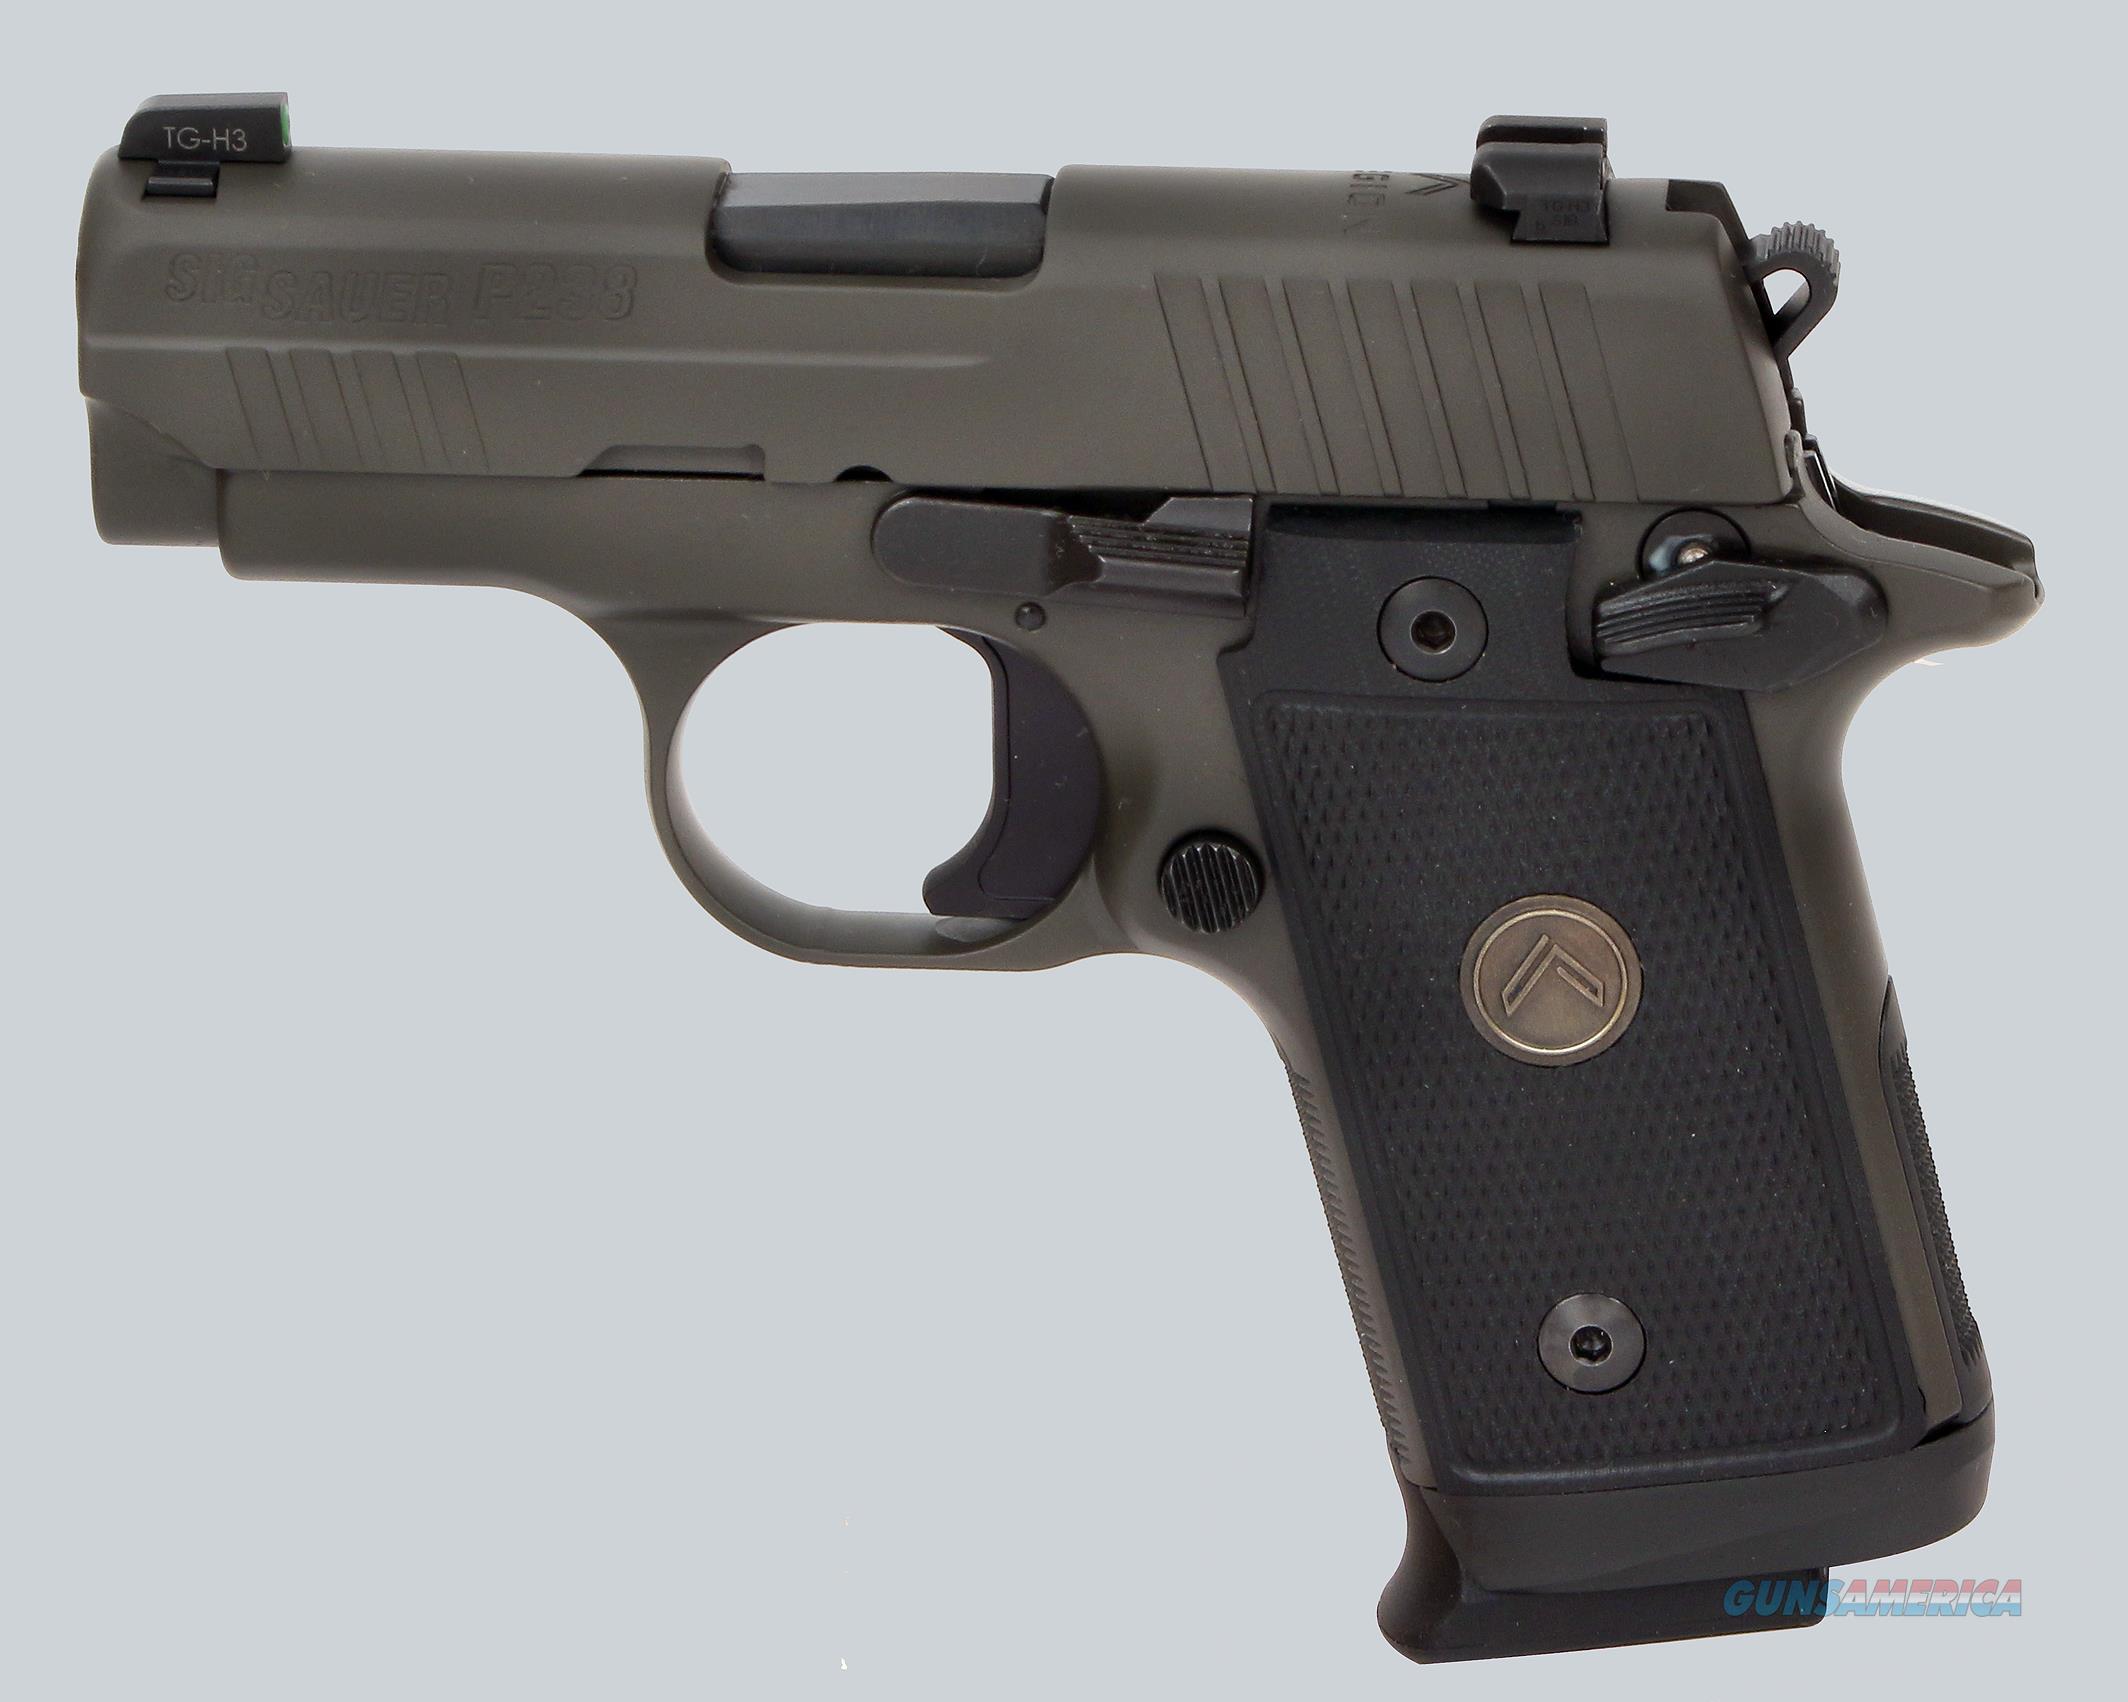 Sig Sauer 380acp P238 Pistol  Guns > Pistols > Sig - Sauer/Sigarms Pistols > P238